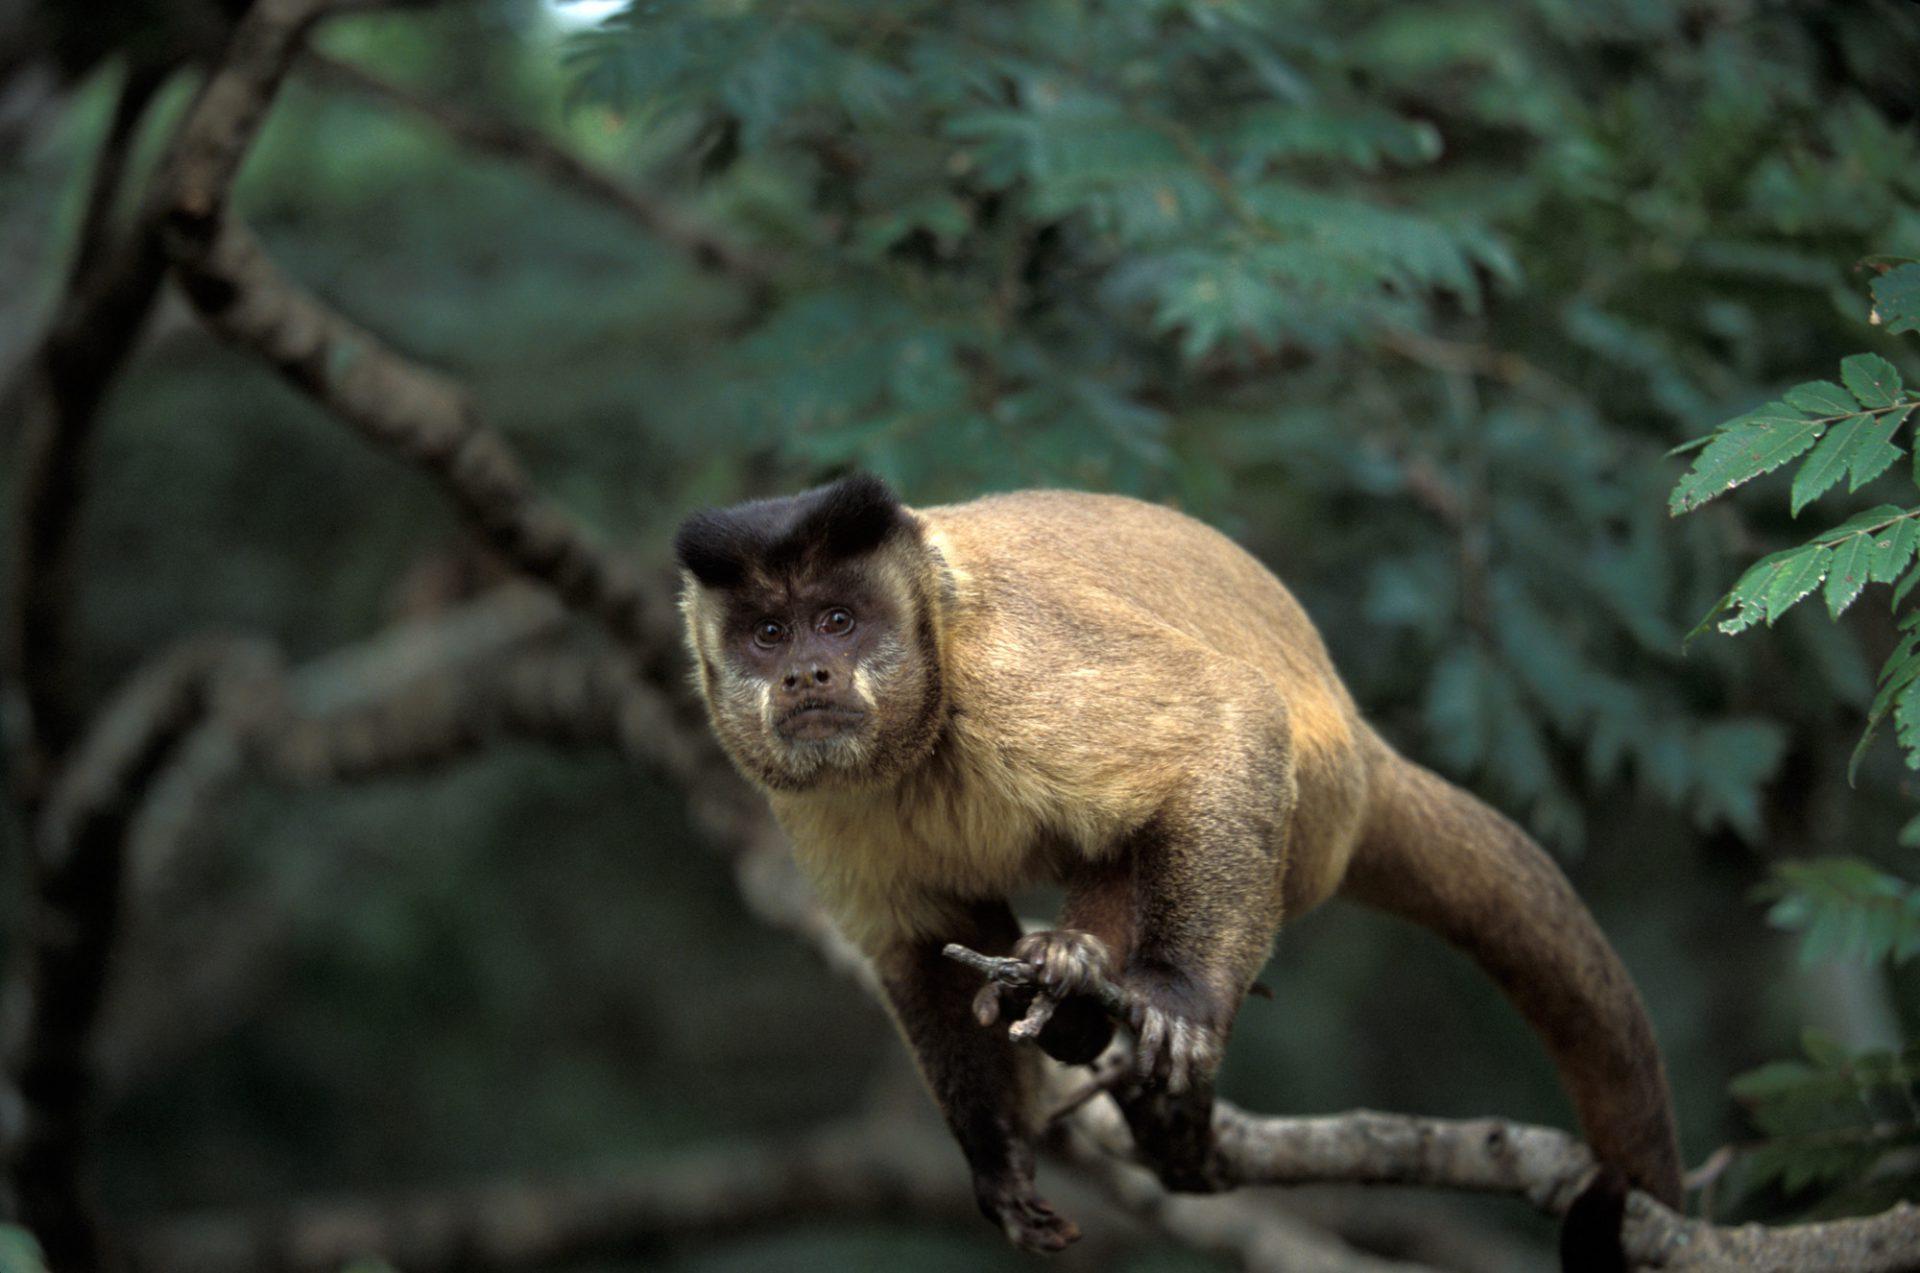 Photo: A capuchin monkey (Cebus cay) in the Pantanal, Brazil.